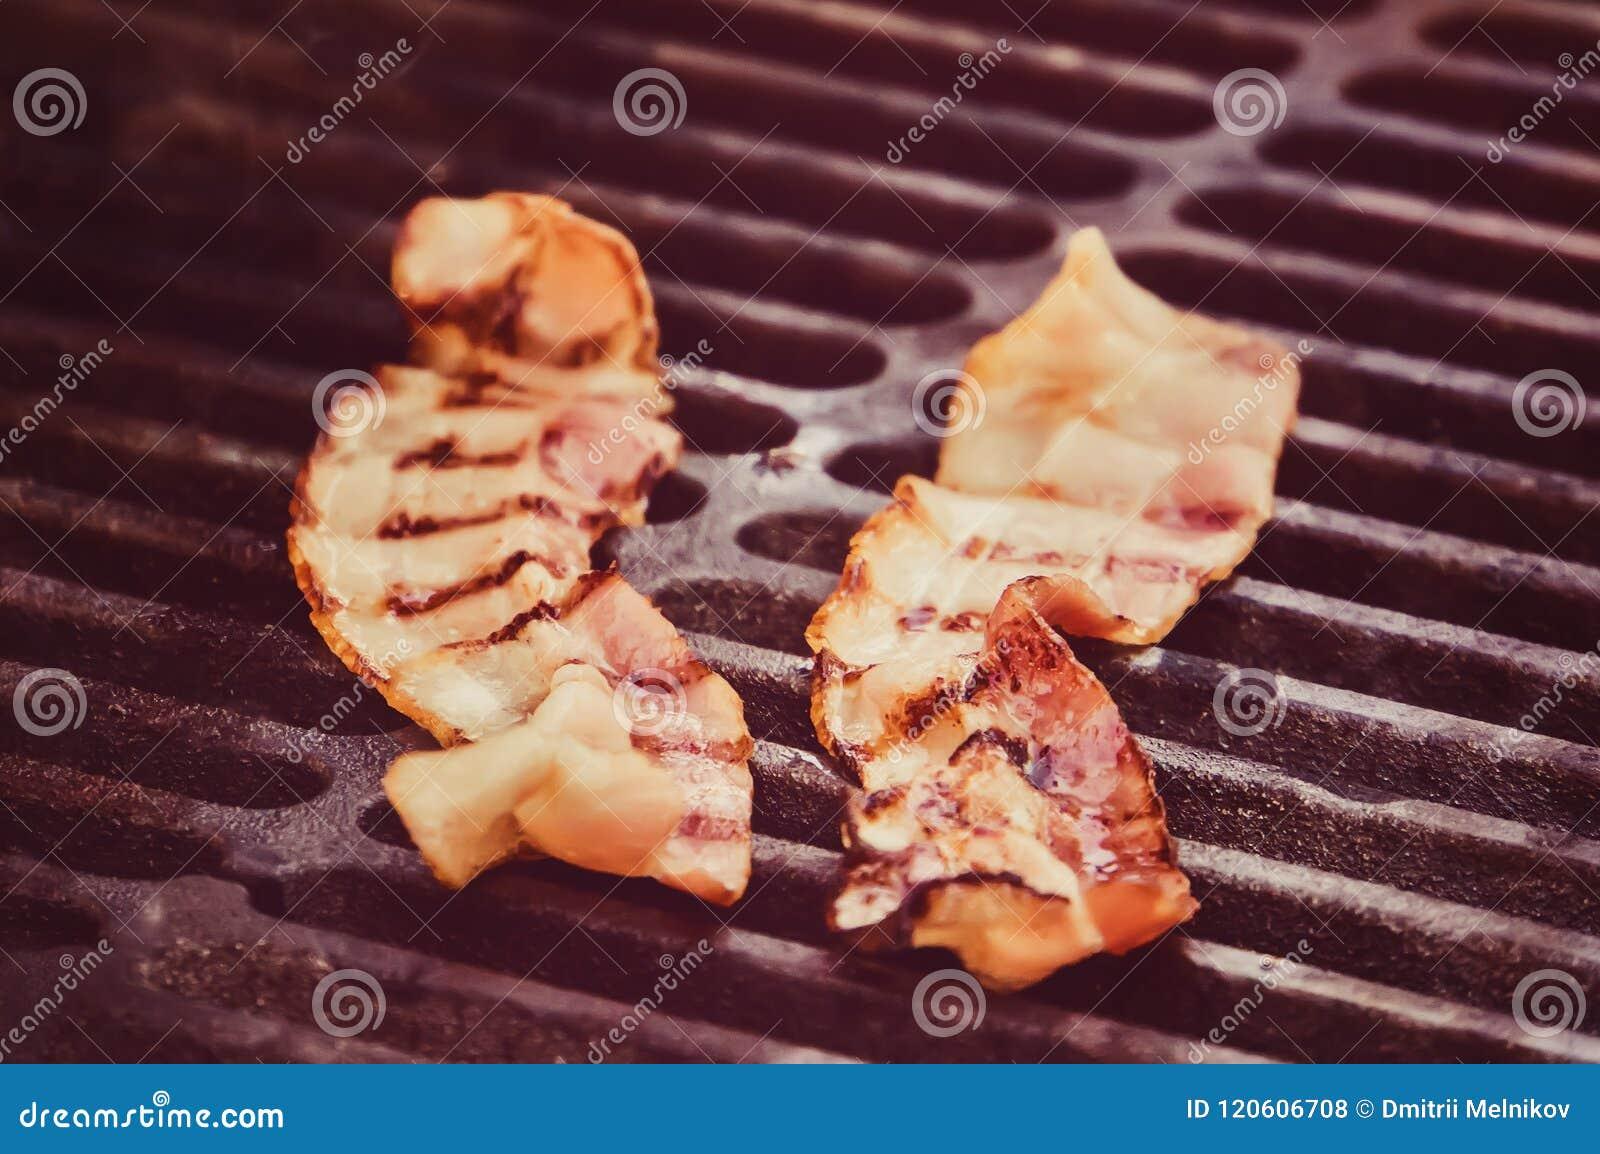 Tang die de knapperige gerookte geroosterde plak van het barbecuebacon houden,